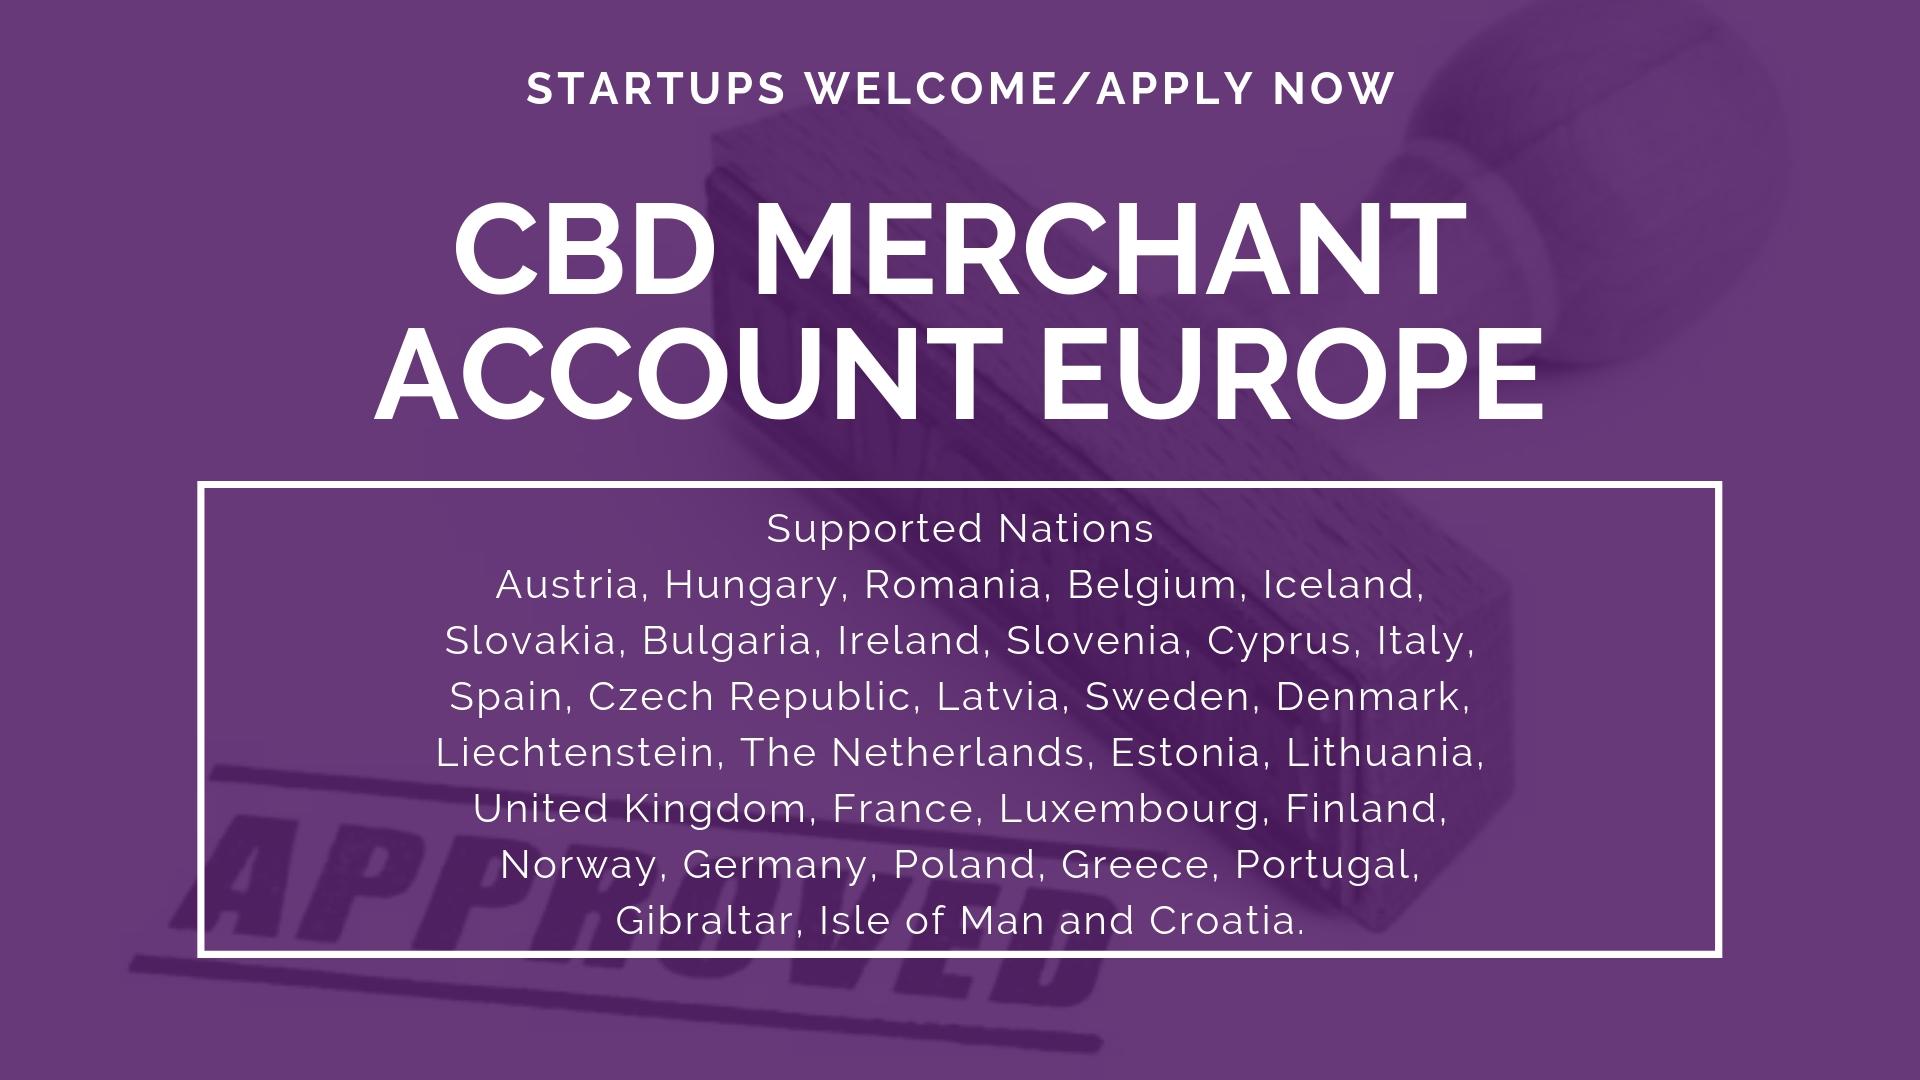 CBD Merchant Account Europe